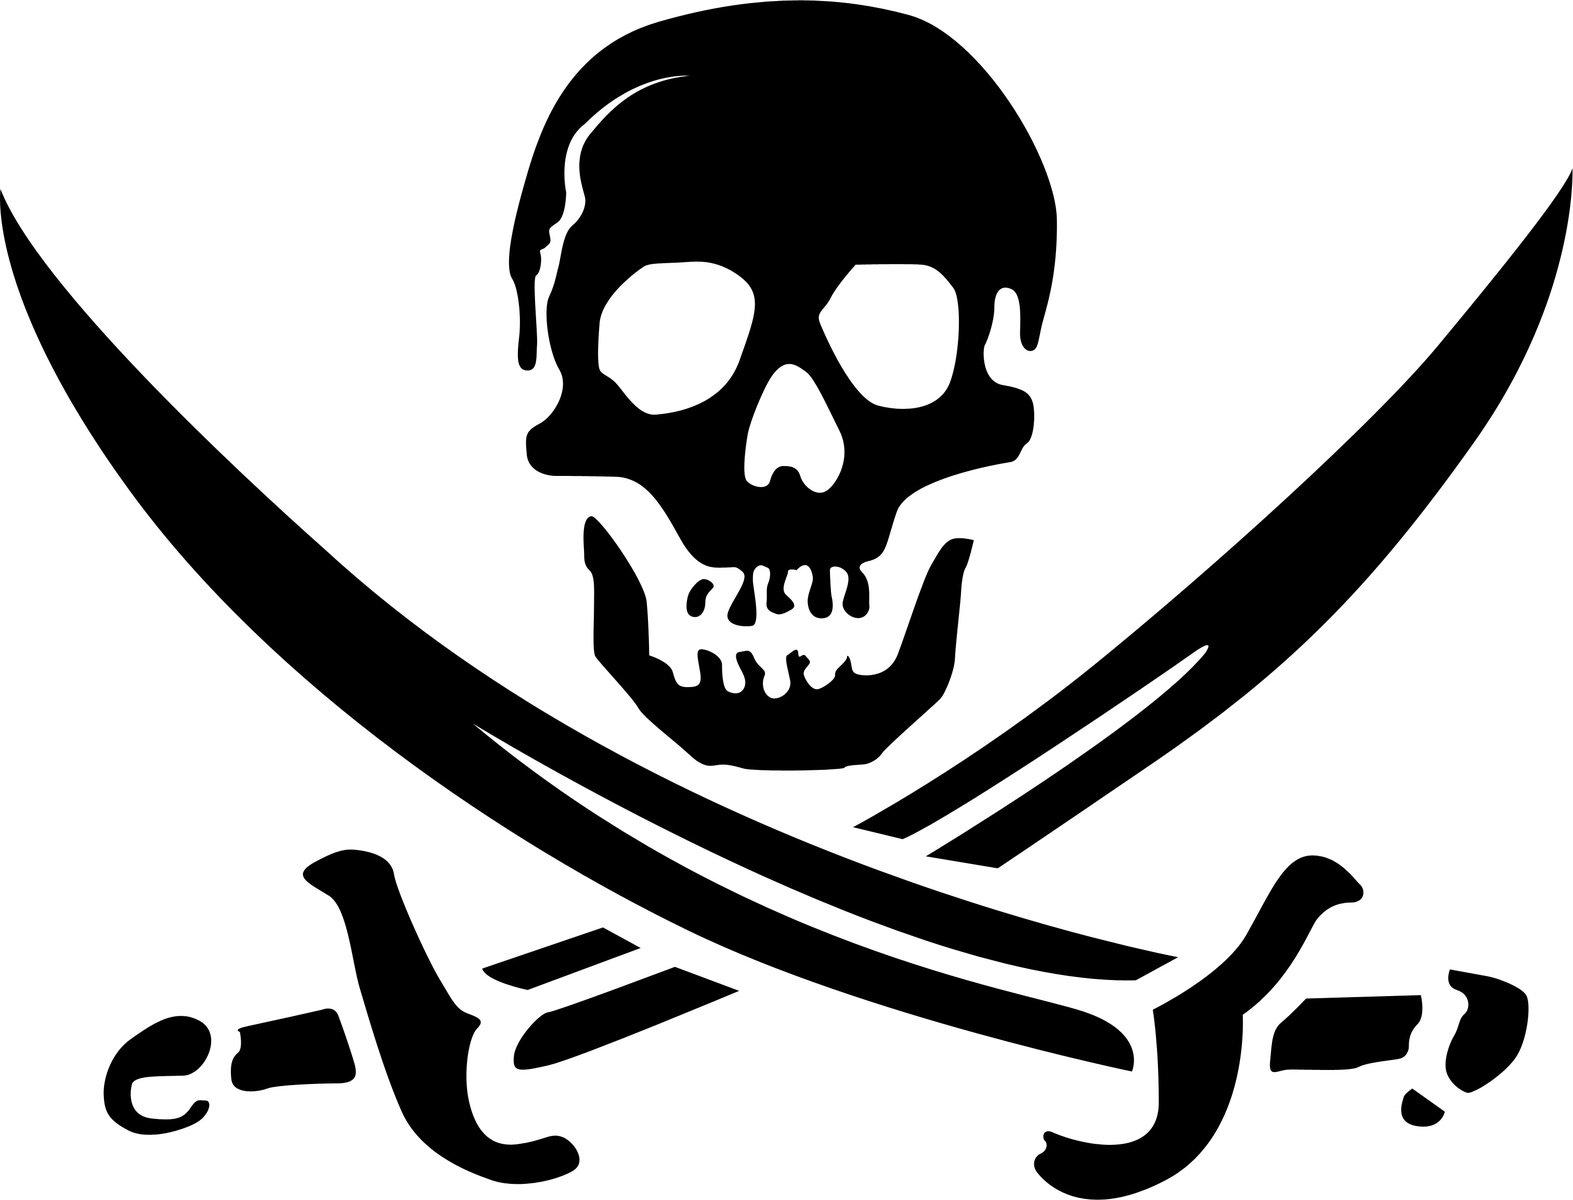 Free Skull Pirate Logo Stock Photo - FreeImages.com